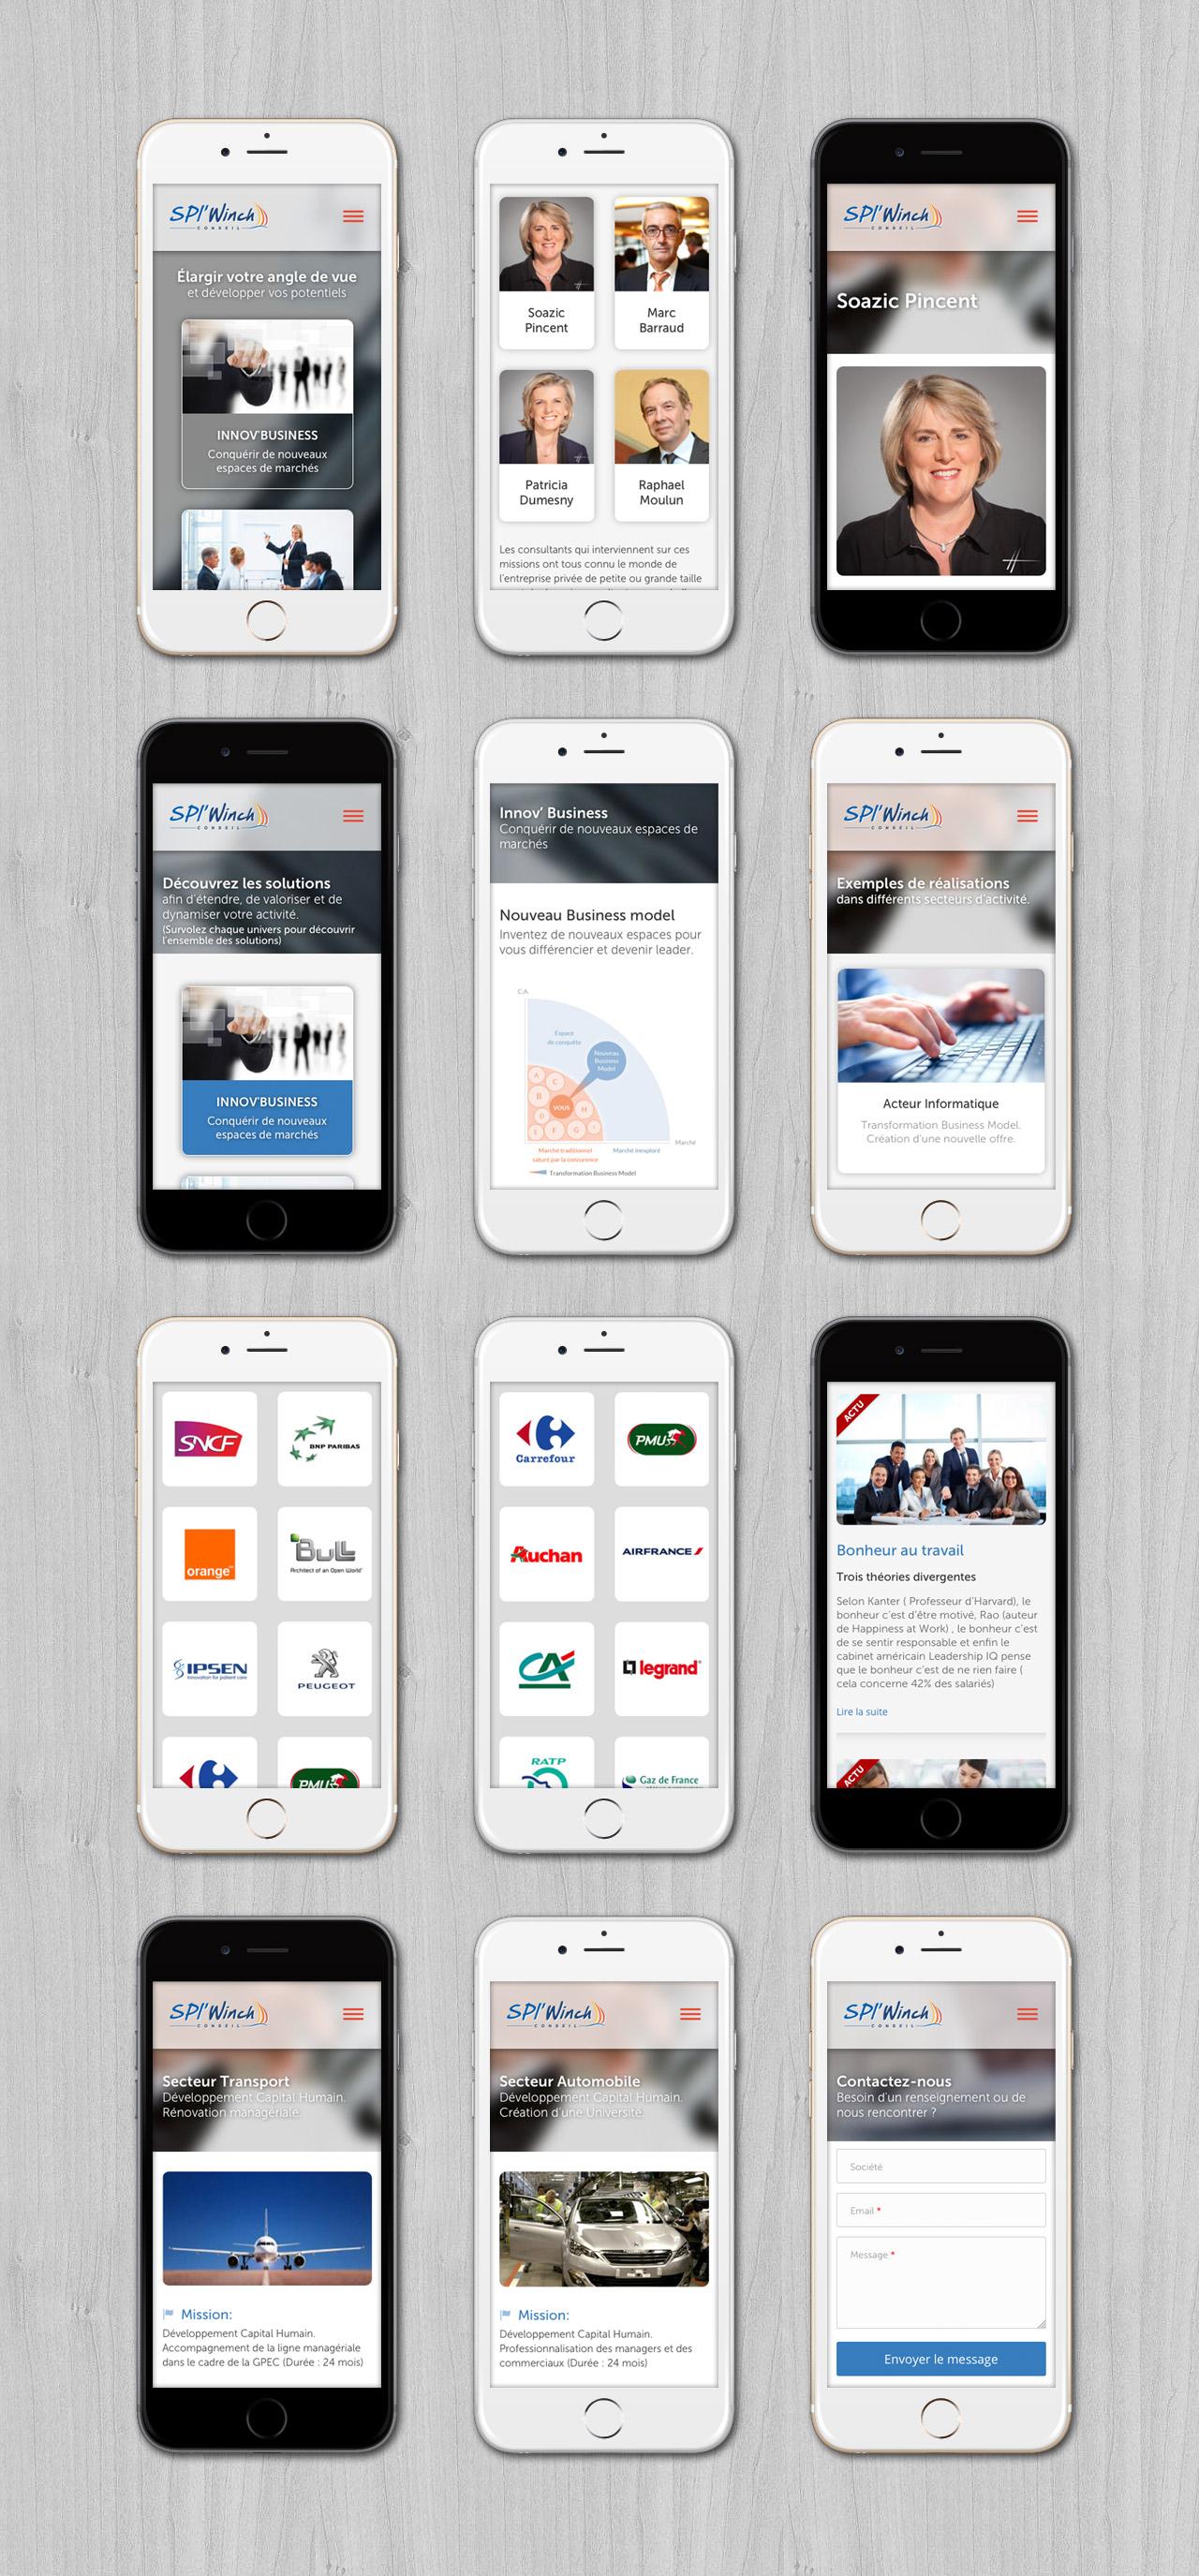 spiwinch-site-mobile-responsive-design-creation-communication-caconcept-alexis-cretin-graphiste